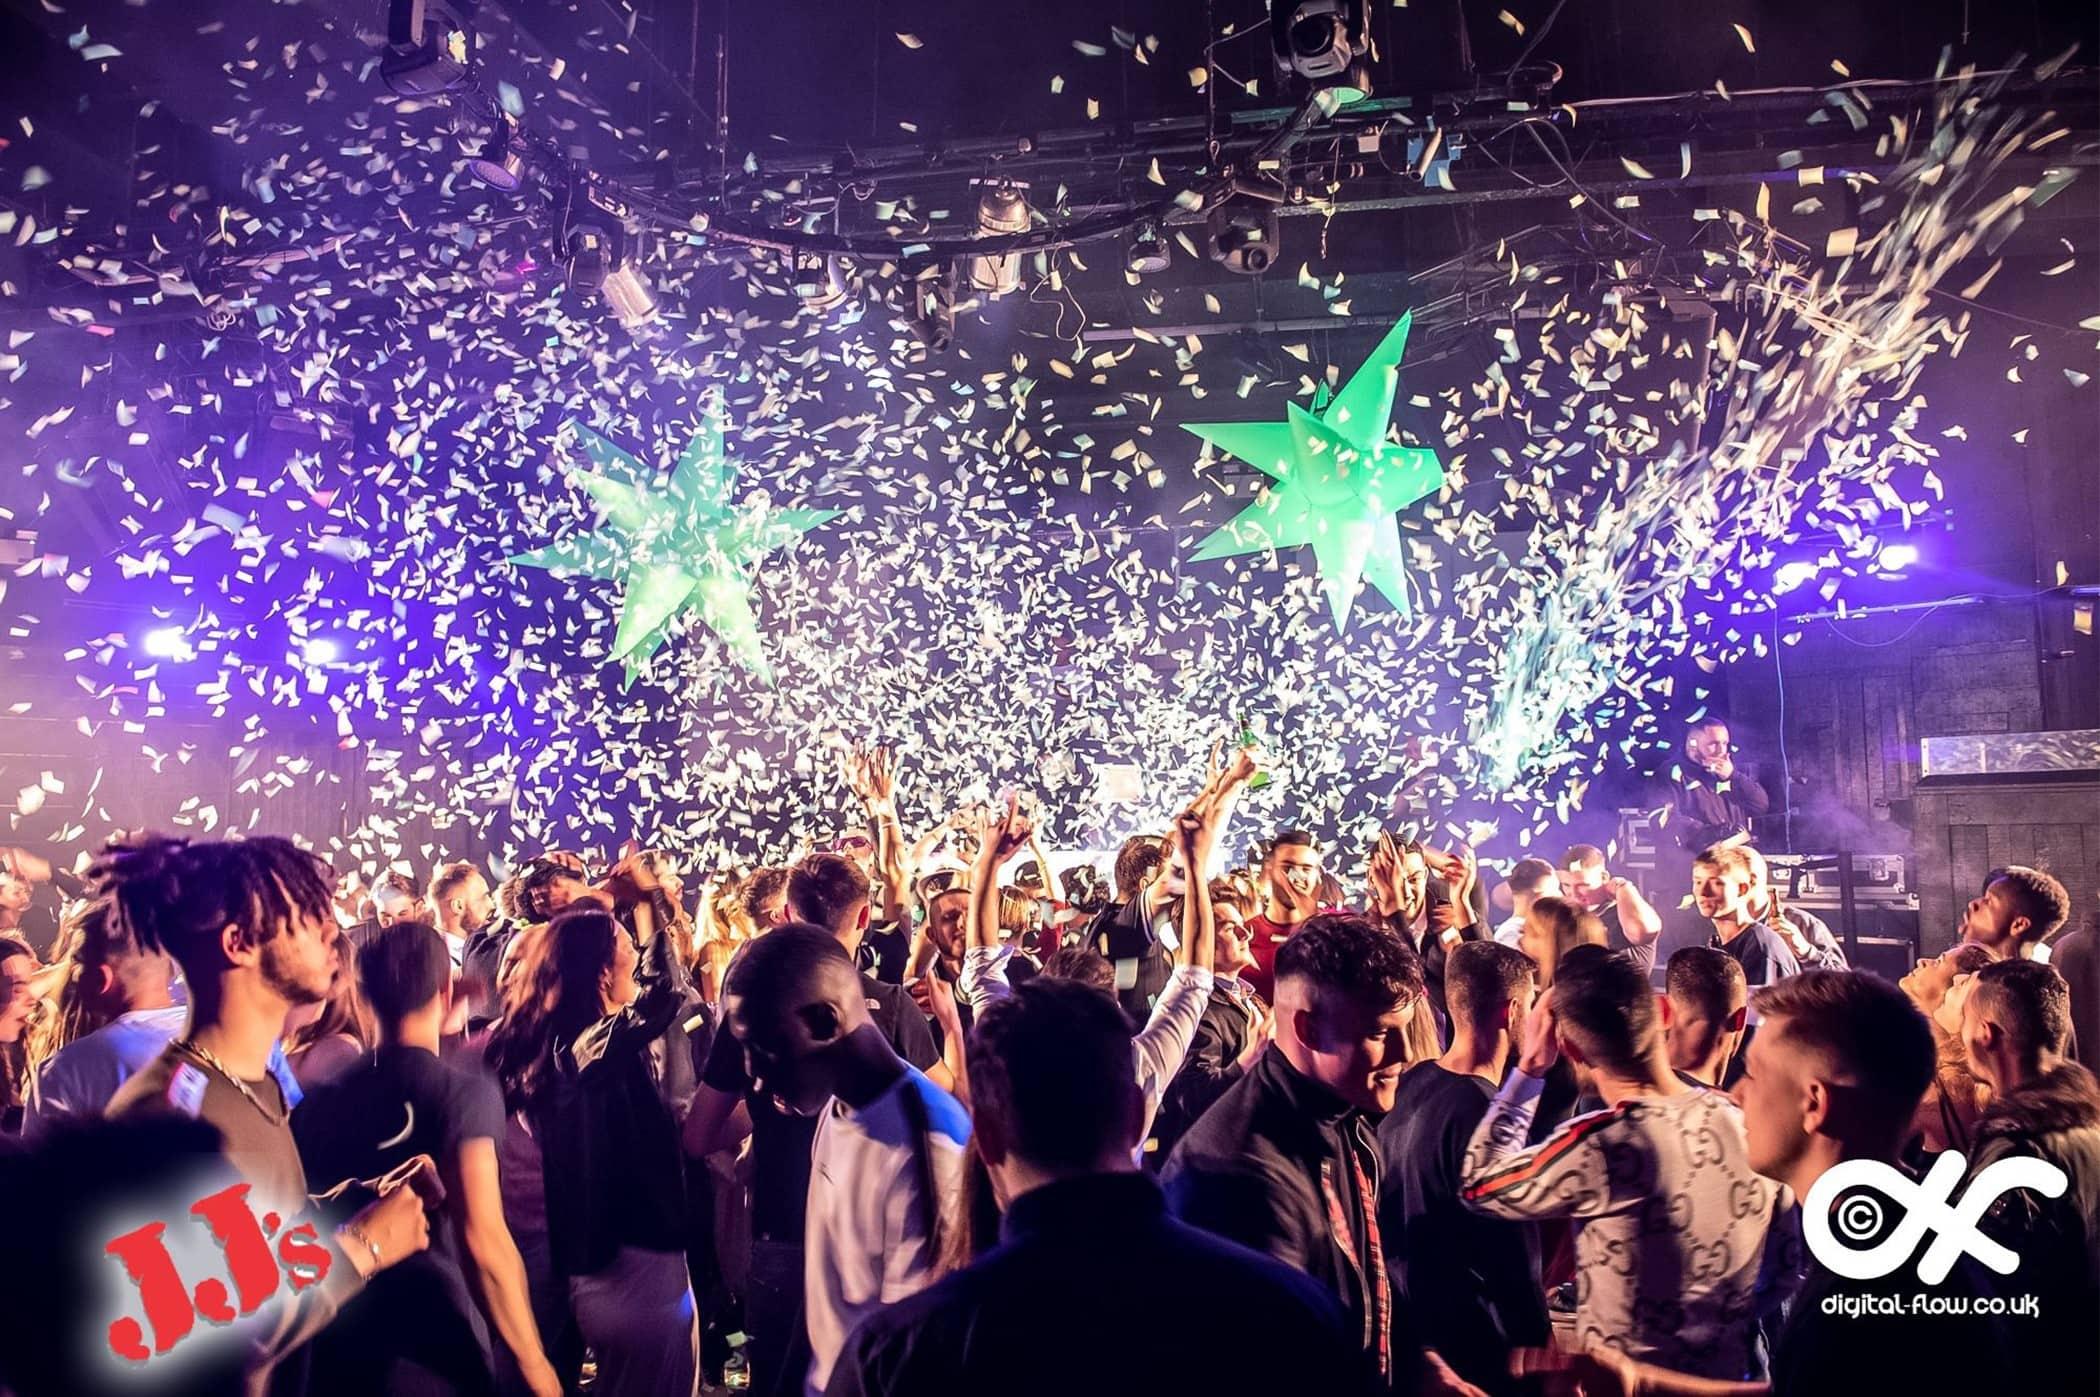 nightclub events, club theme